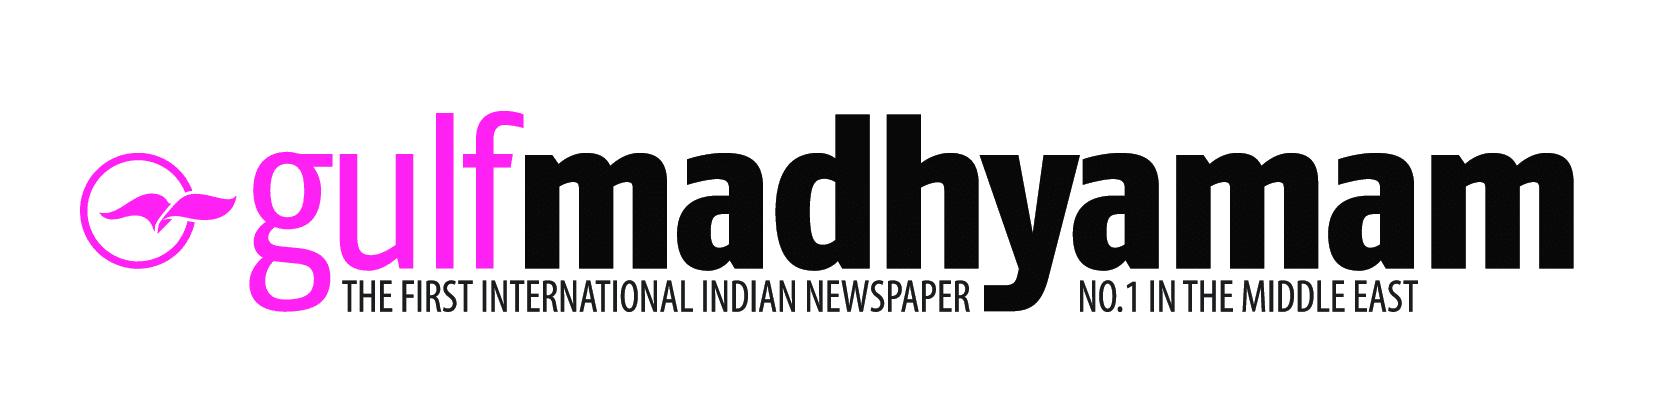 Gulf_Madhyamam